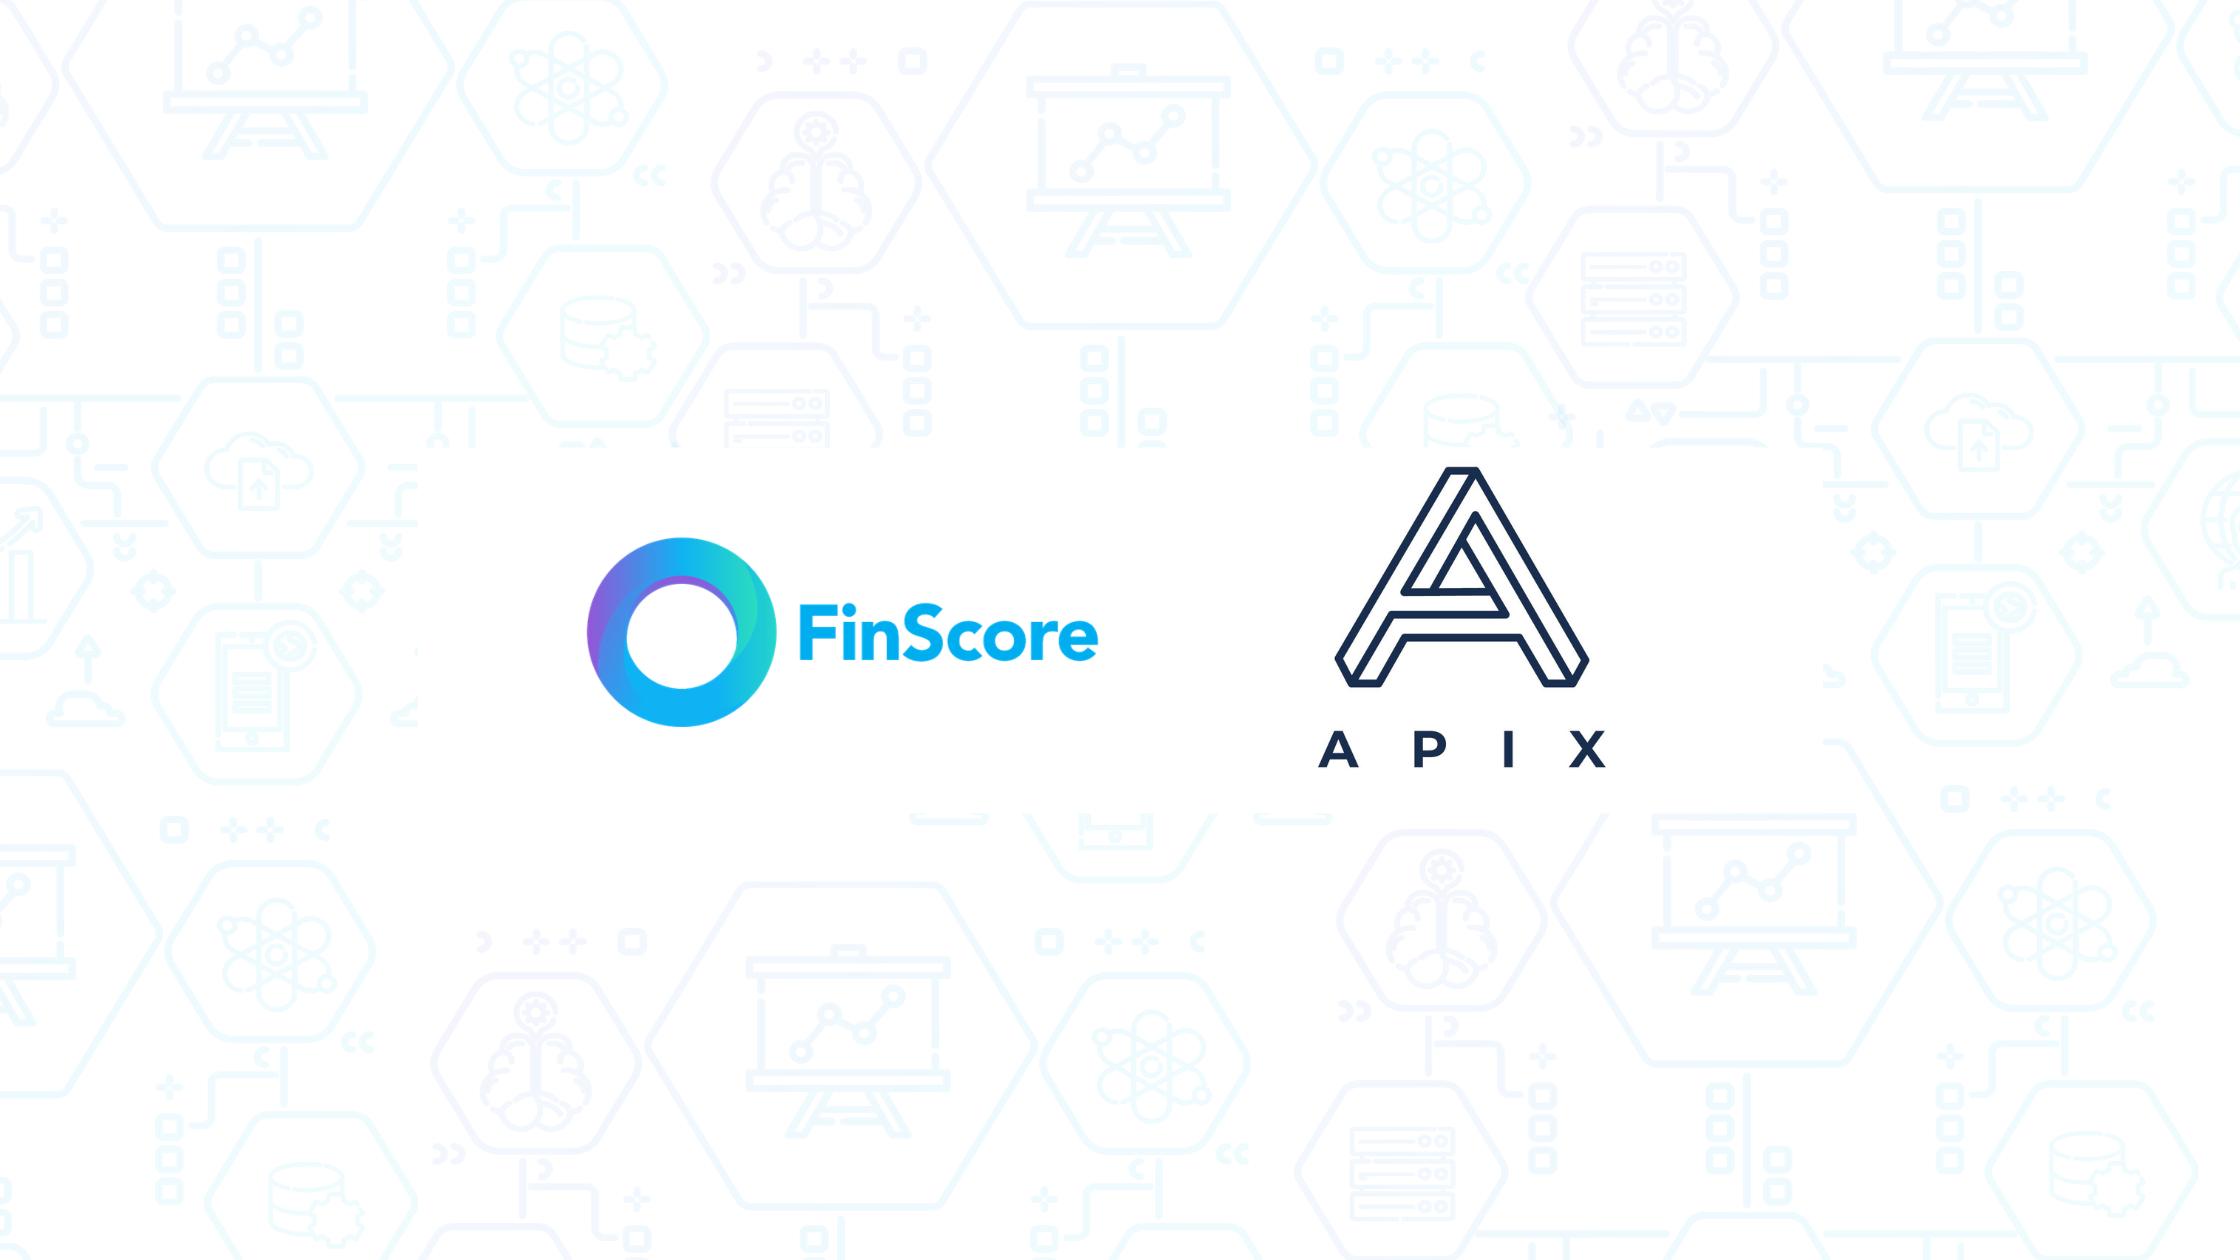 APIX x FinScore